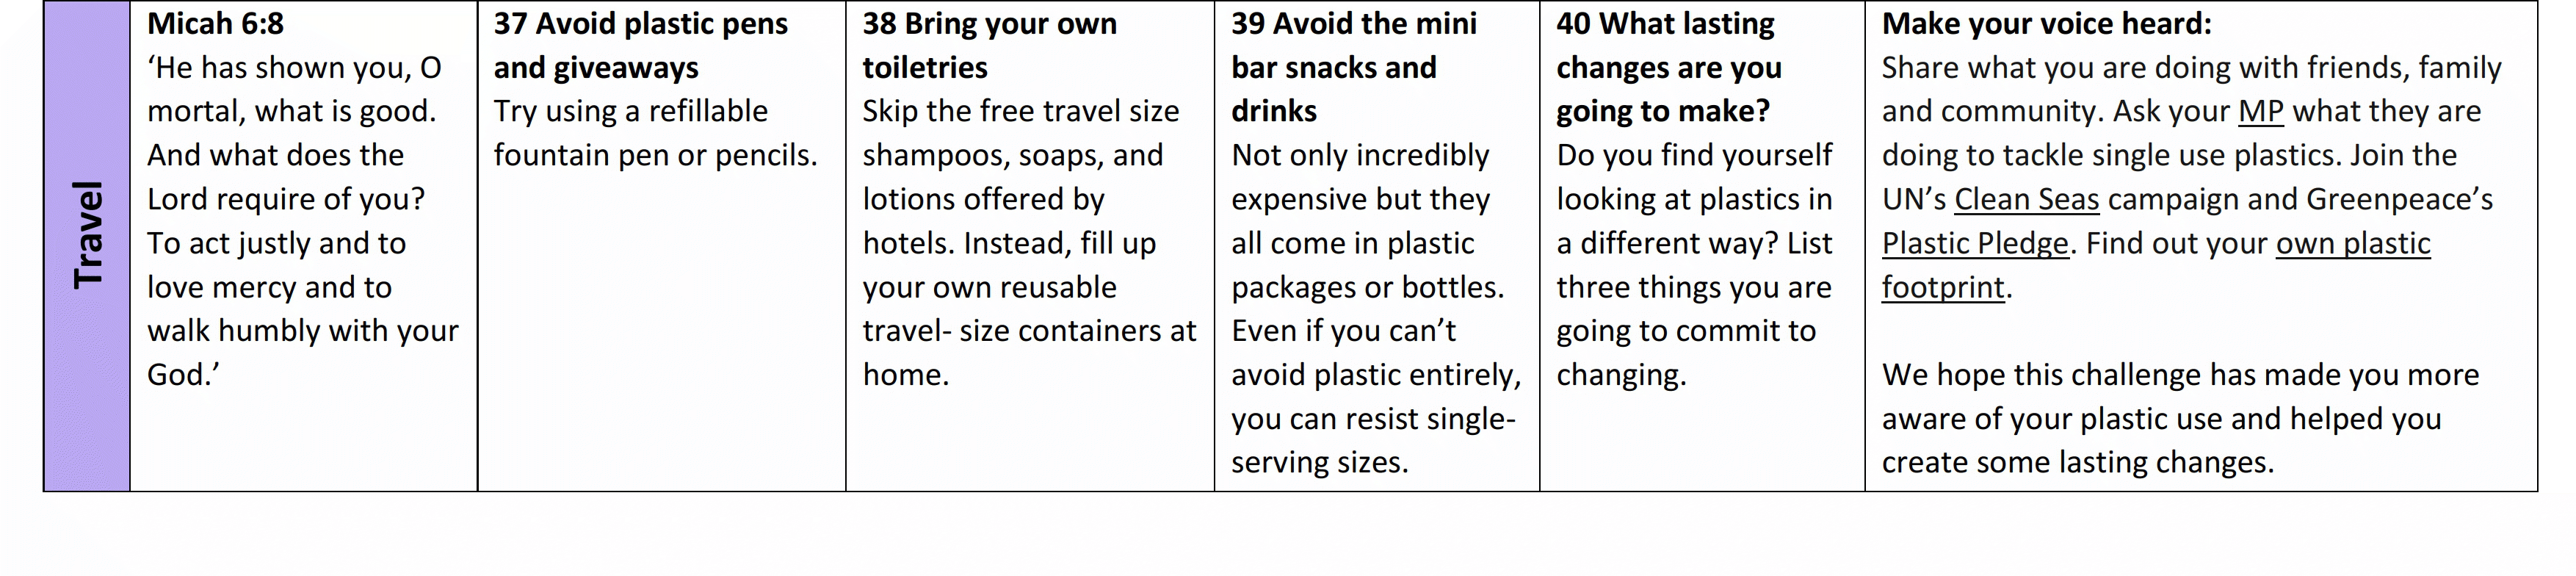 Plastic_Free_CofE_ Environment PORTRAIT - Copy (2)[2]